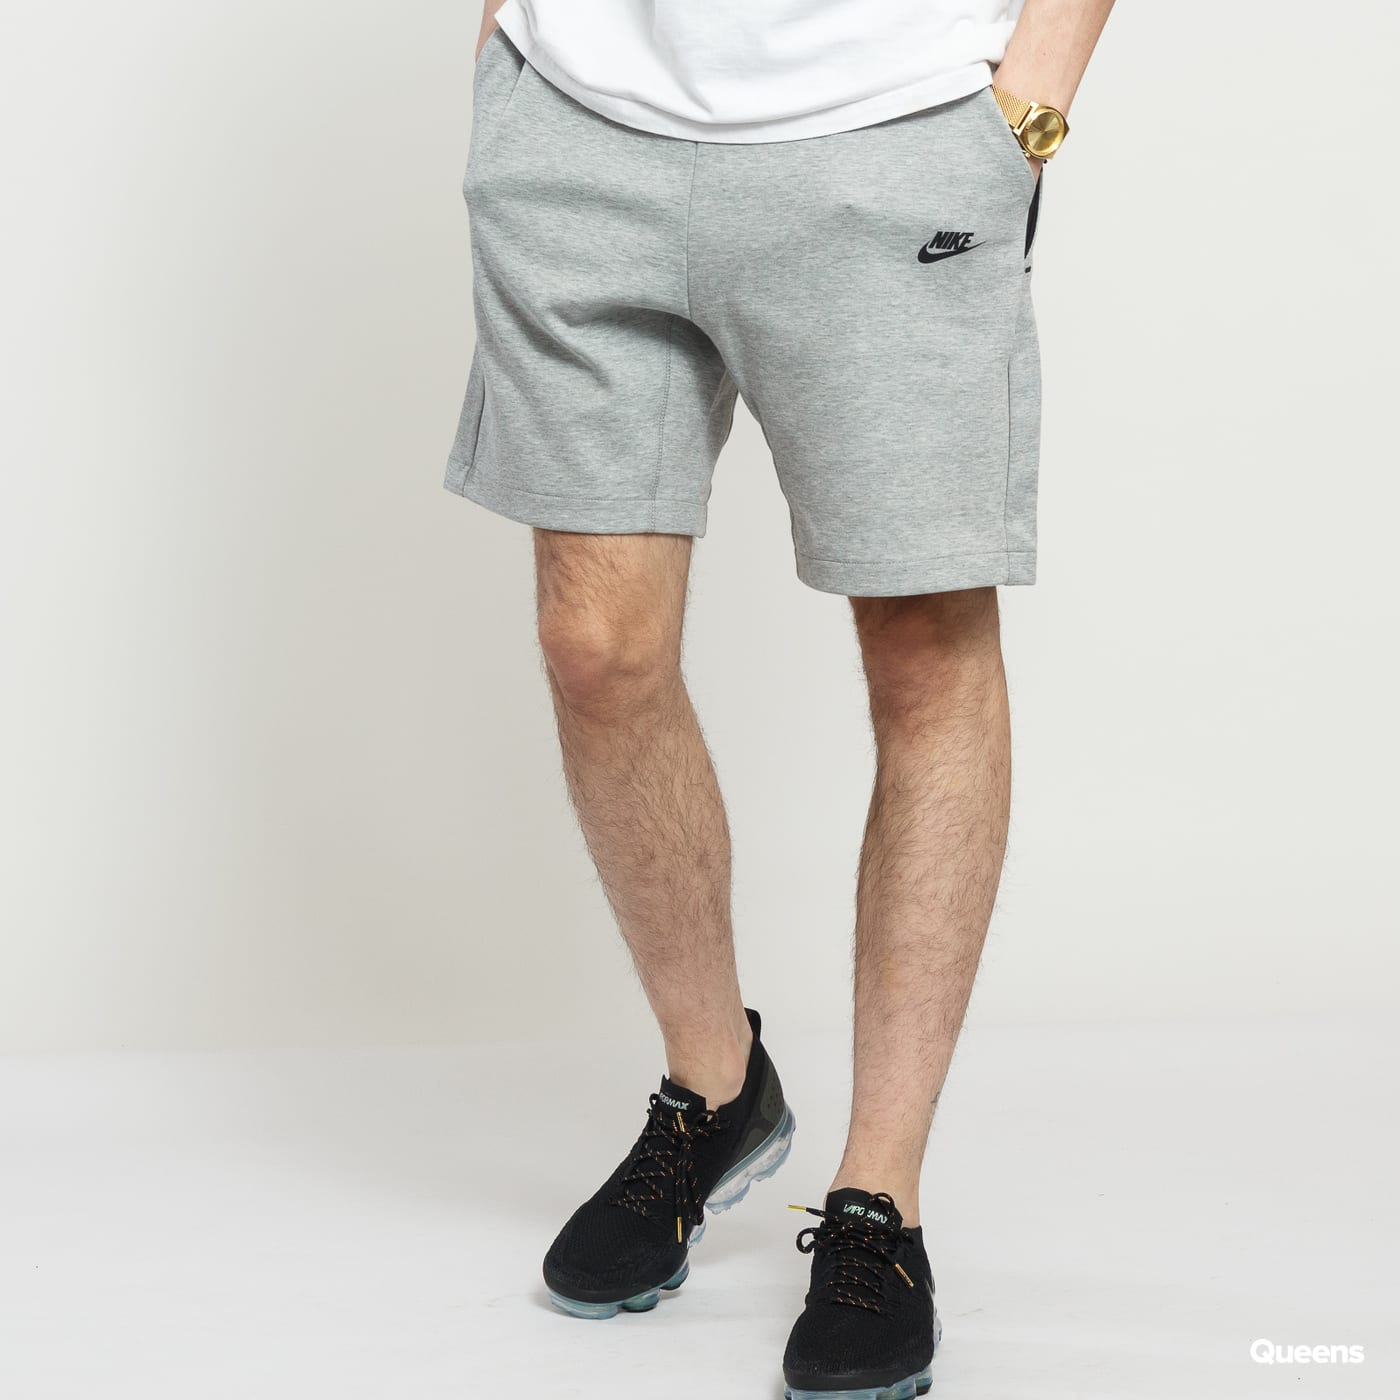 8af730d276d Sweat Shorts Nike M NSW Tech Fleece Short melange gray (928513-063) –  Queens 💚